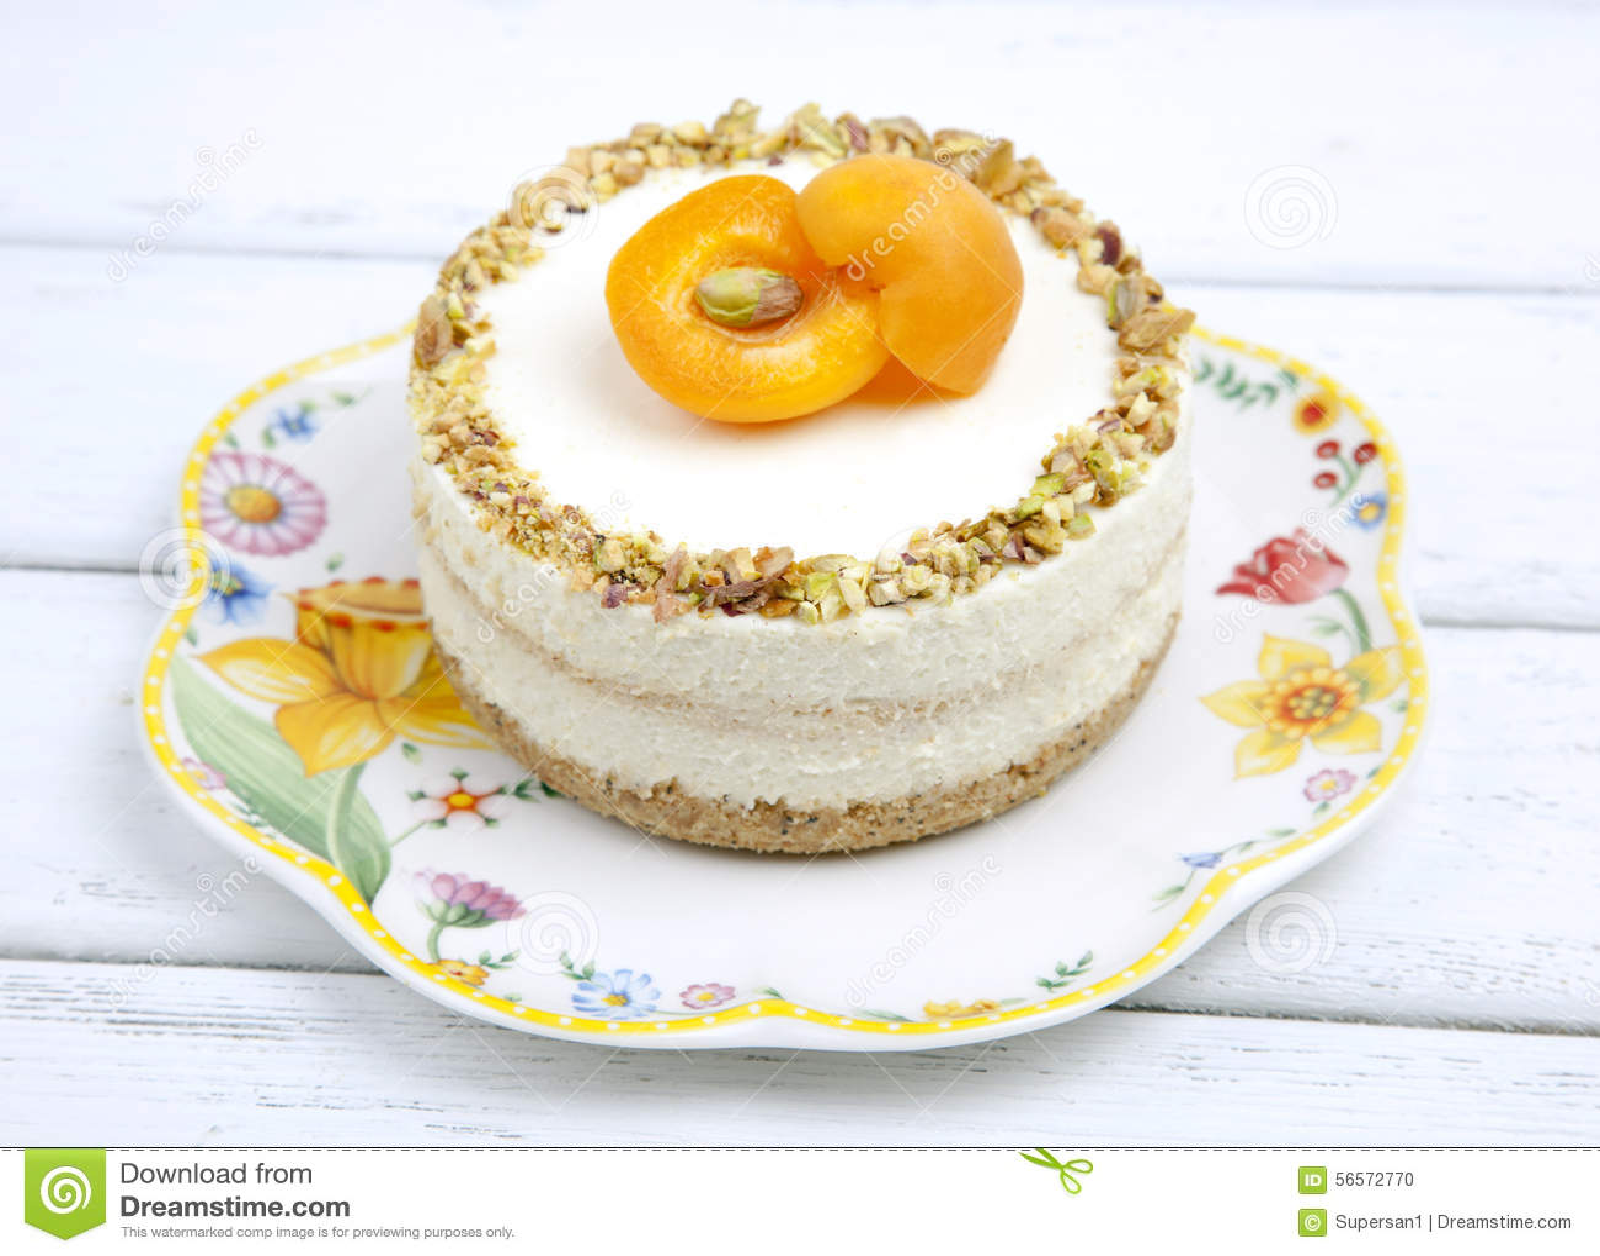 Download Cheesecake με τα βερίκοκα στοκ εικόνες. εικόνα από γαλακτοκομείο - 56572770